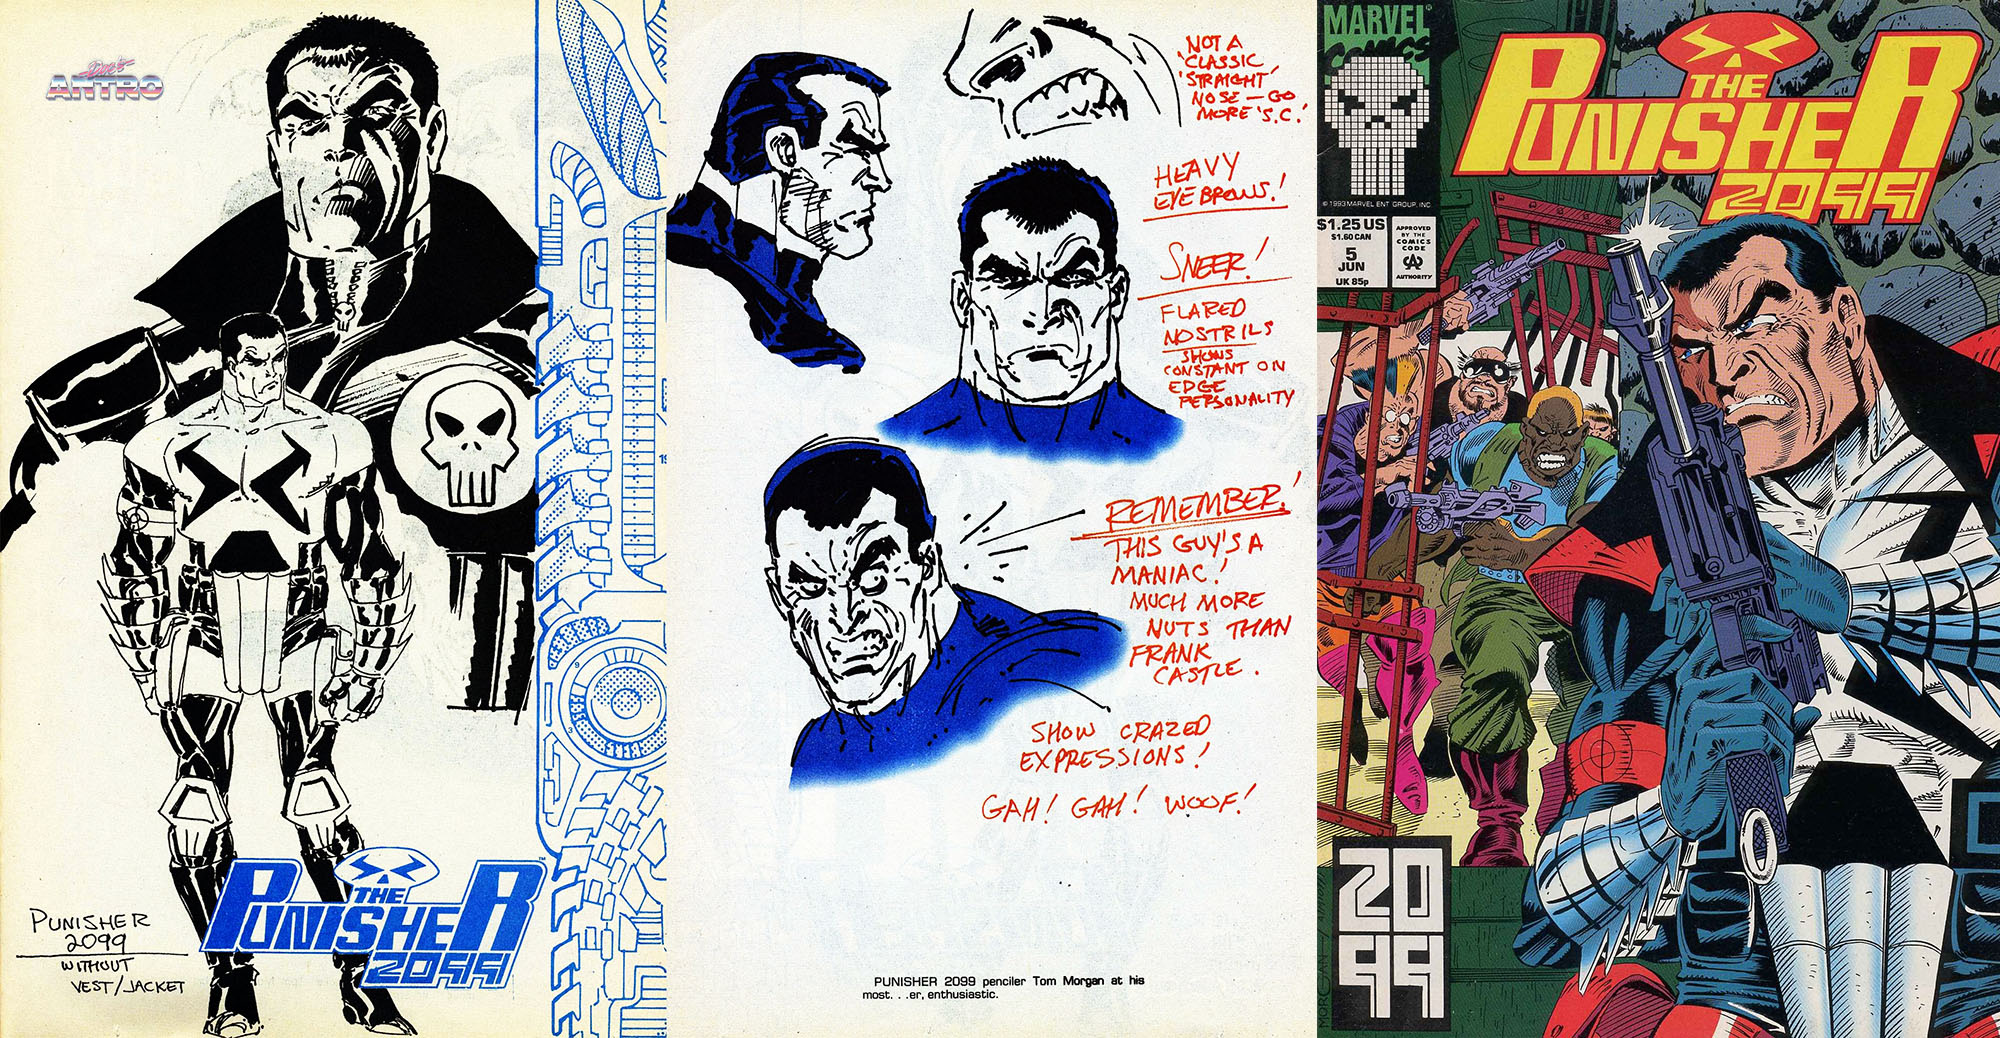 Punisher Punitore 2099